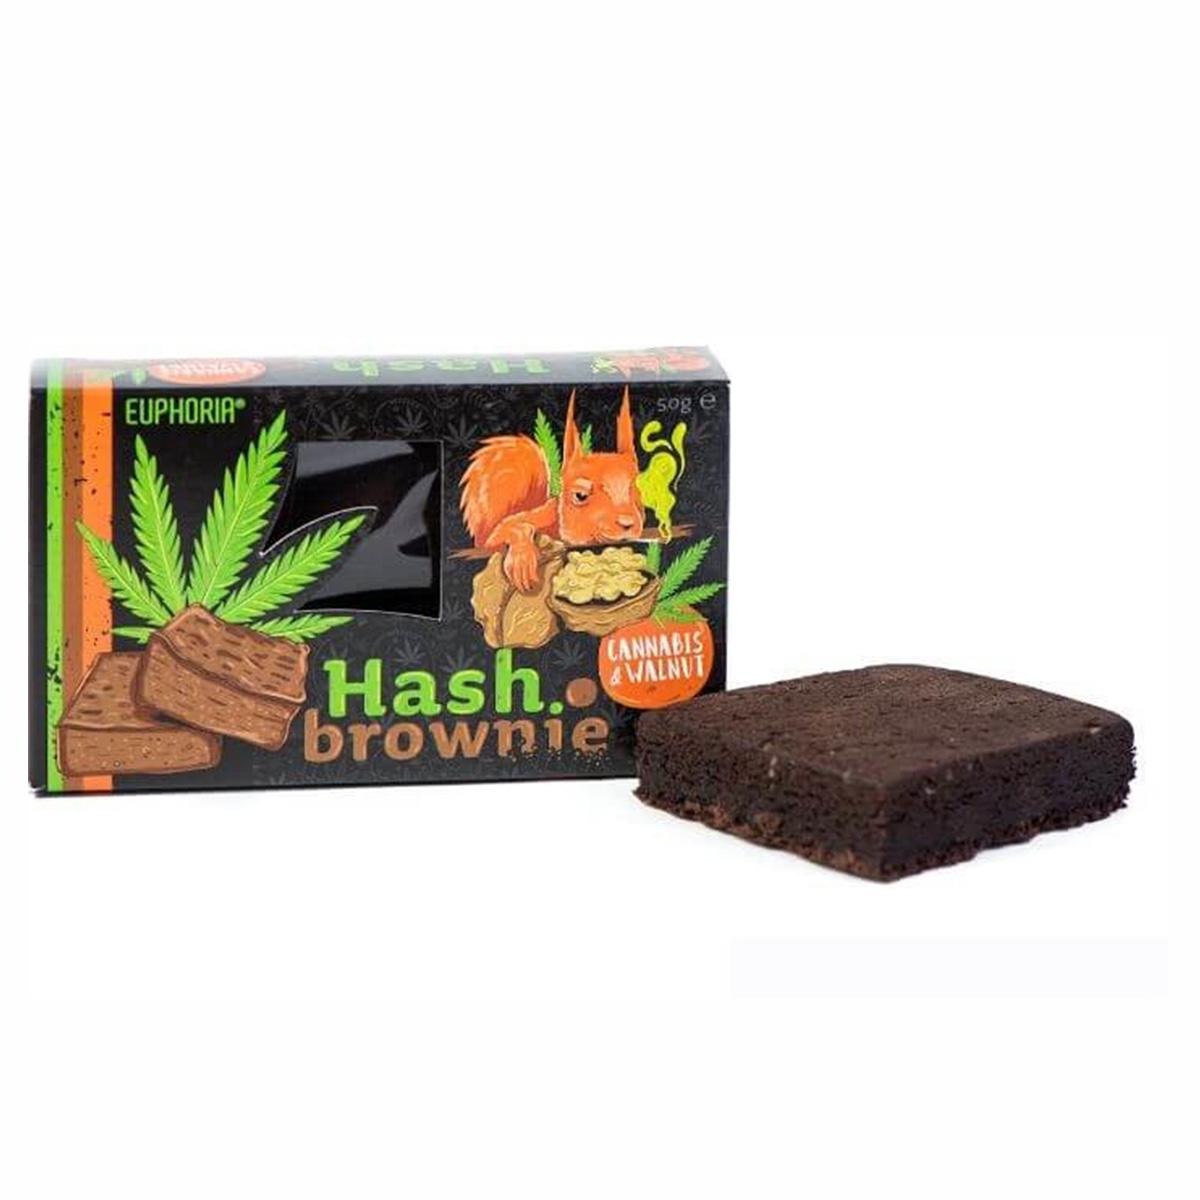 Hash Brownie Cannabis & Walnut